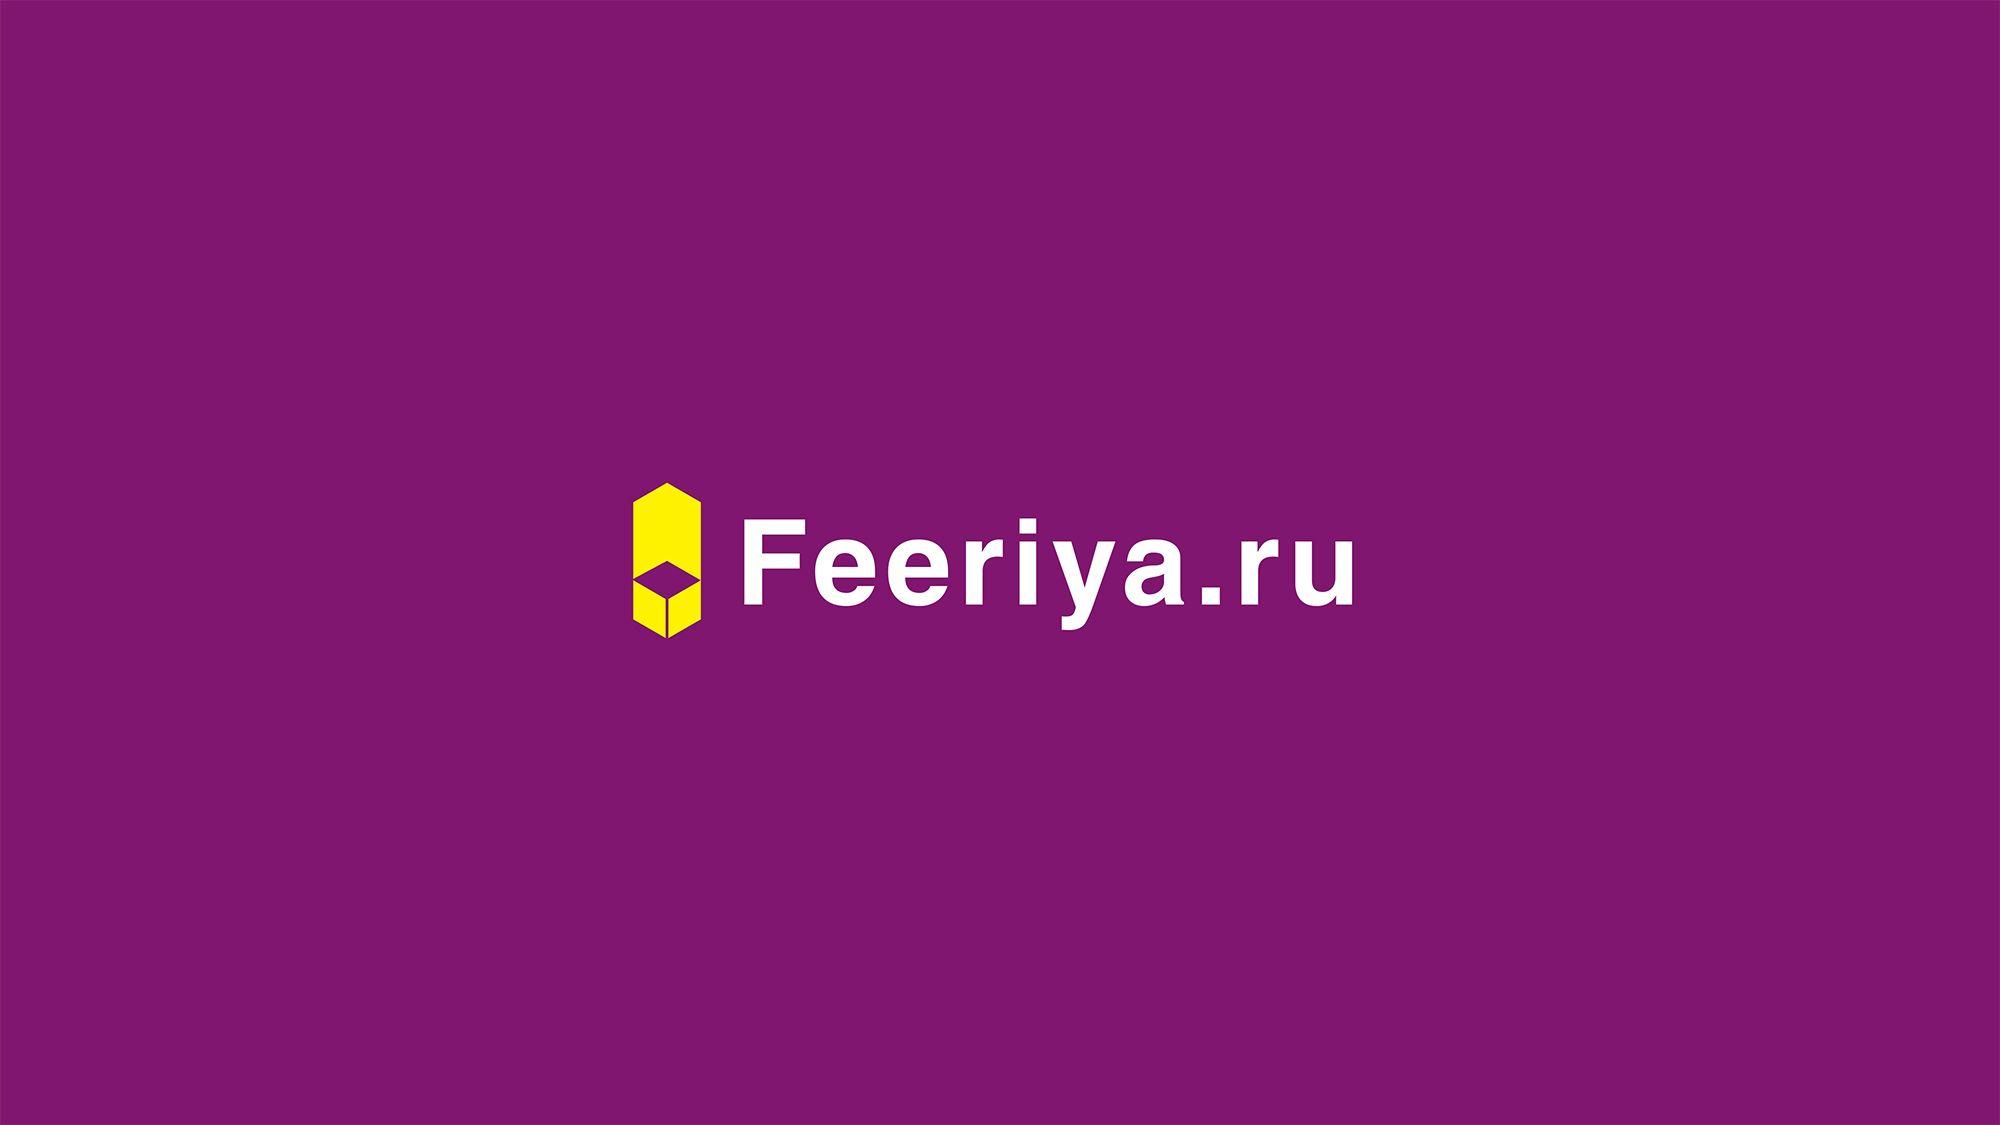 Логотип для feeriya.ru - дизайнер sasha01